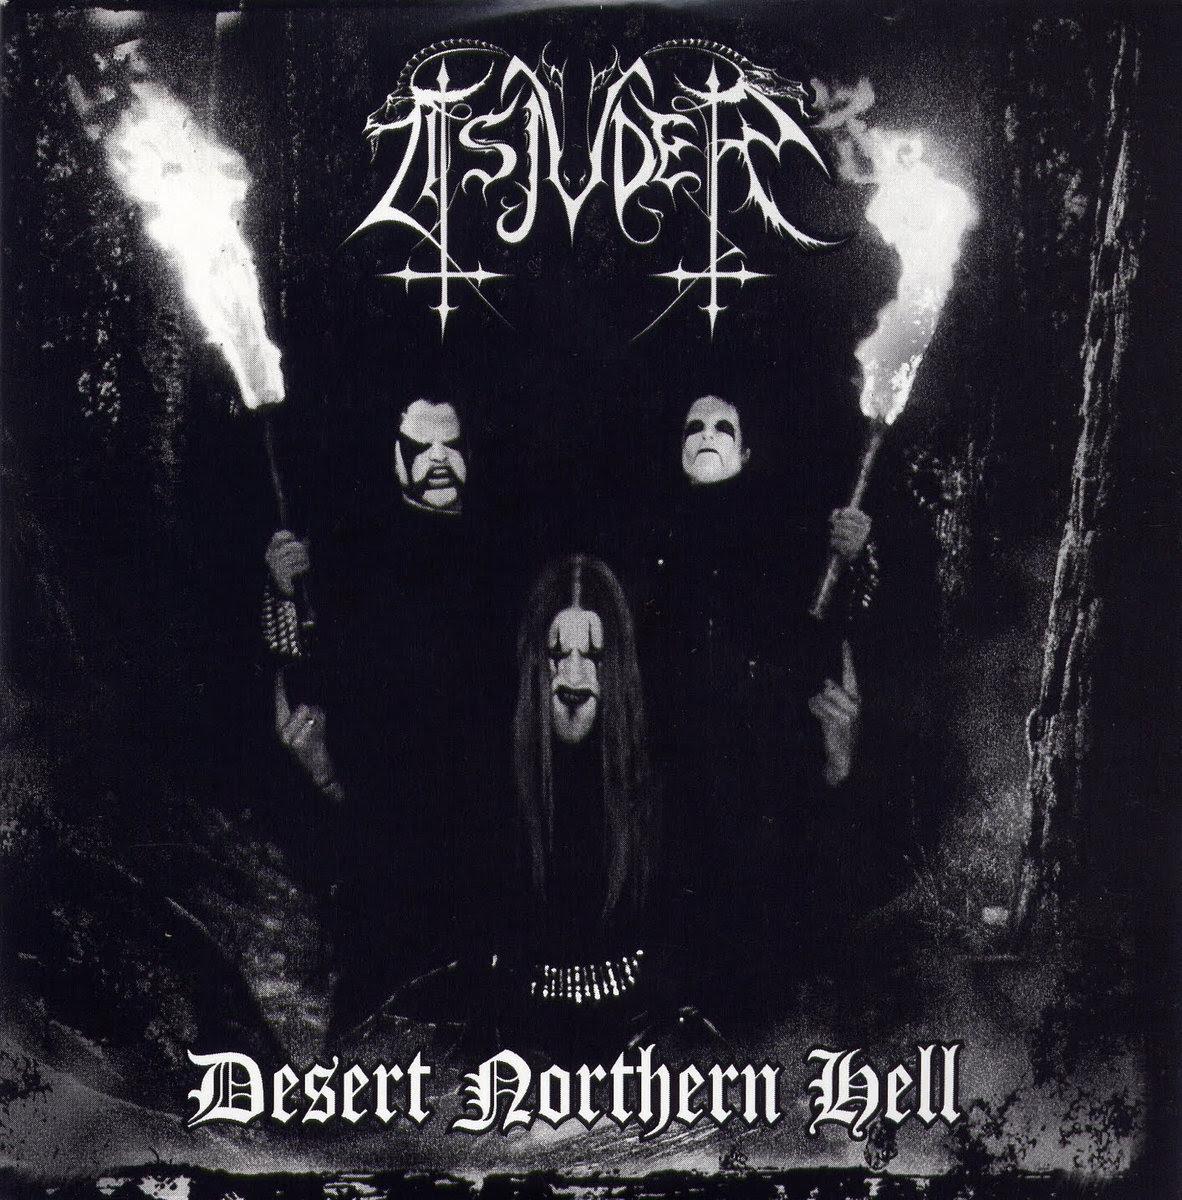 Tsjuder - Desert Northern Hell (2004)